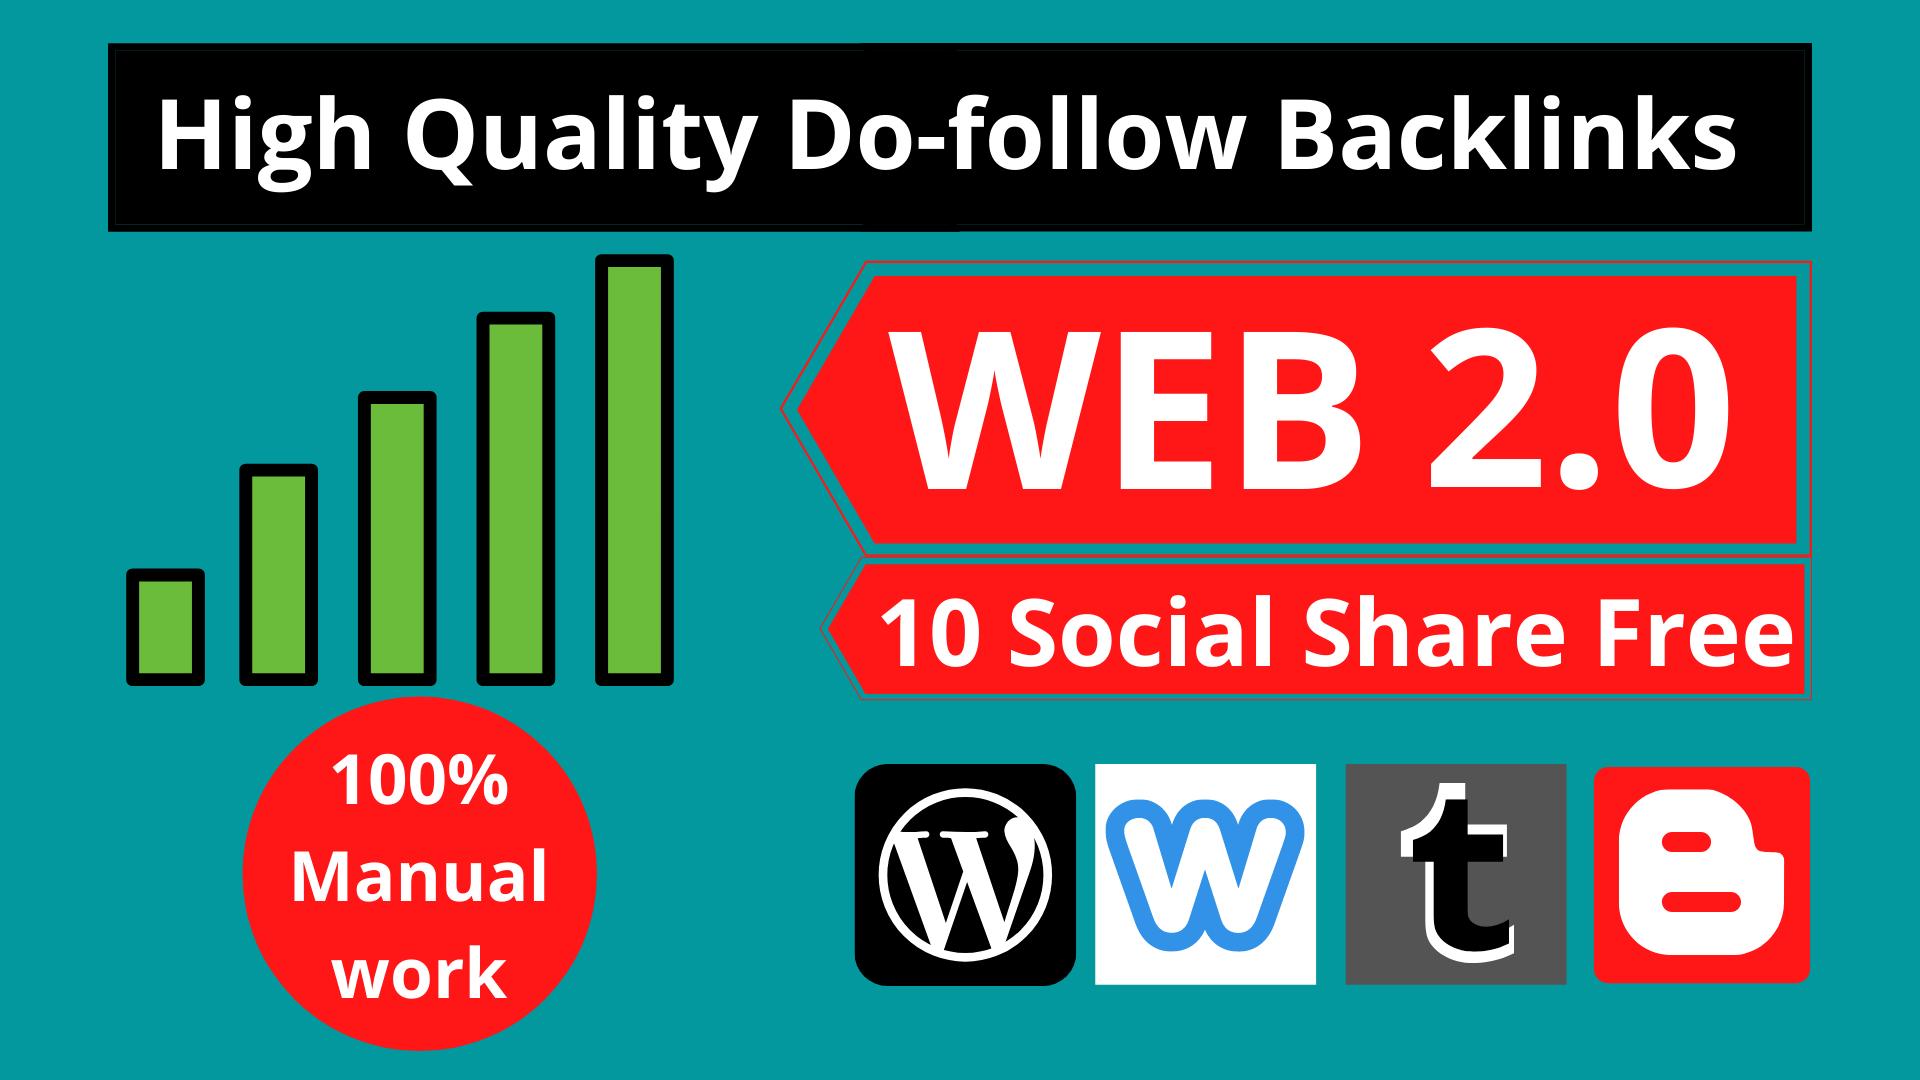 Get 15 High Quality Web 2.0 Backlink